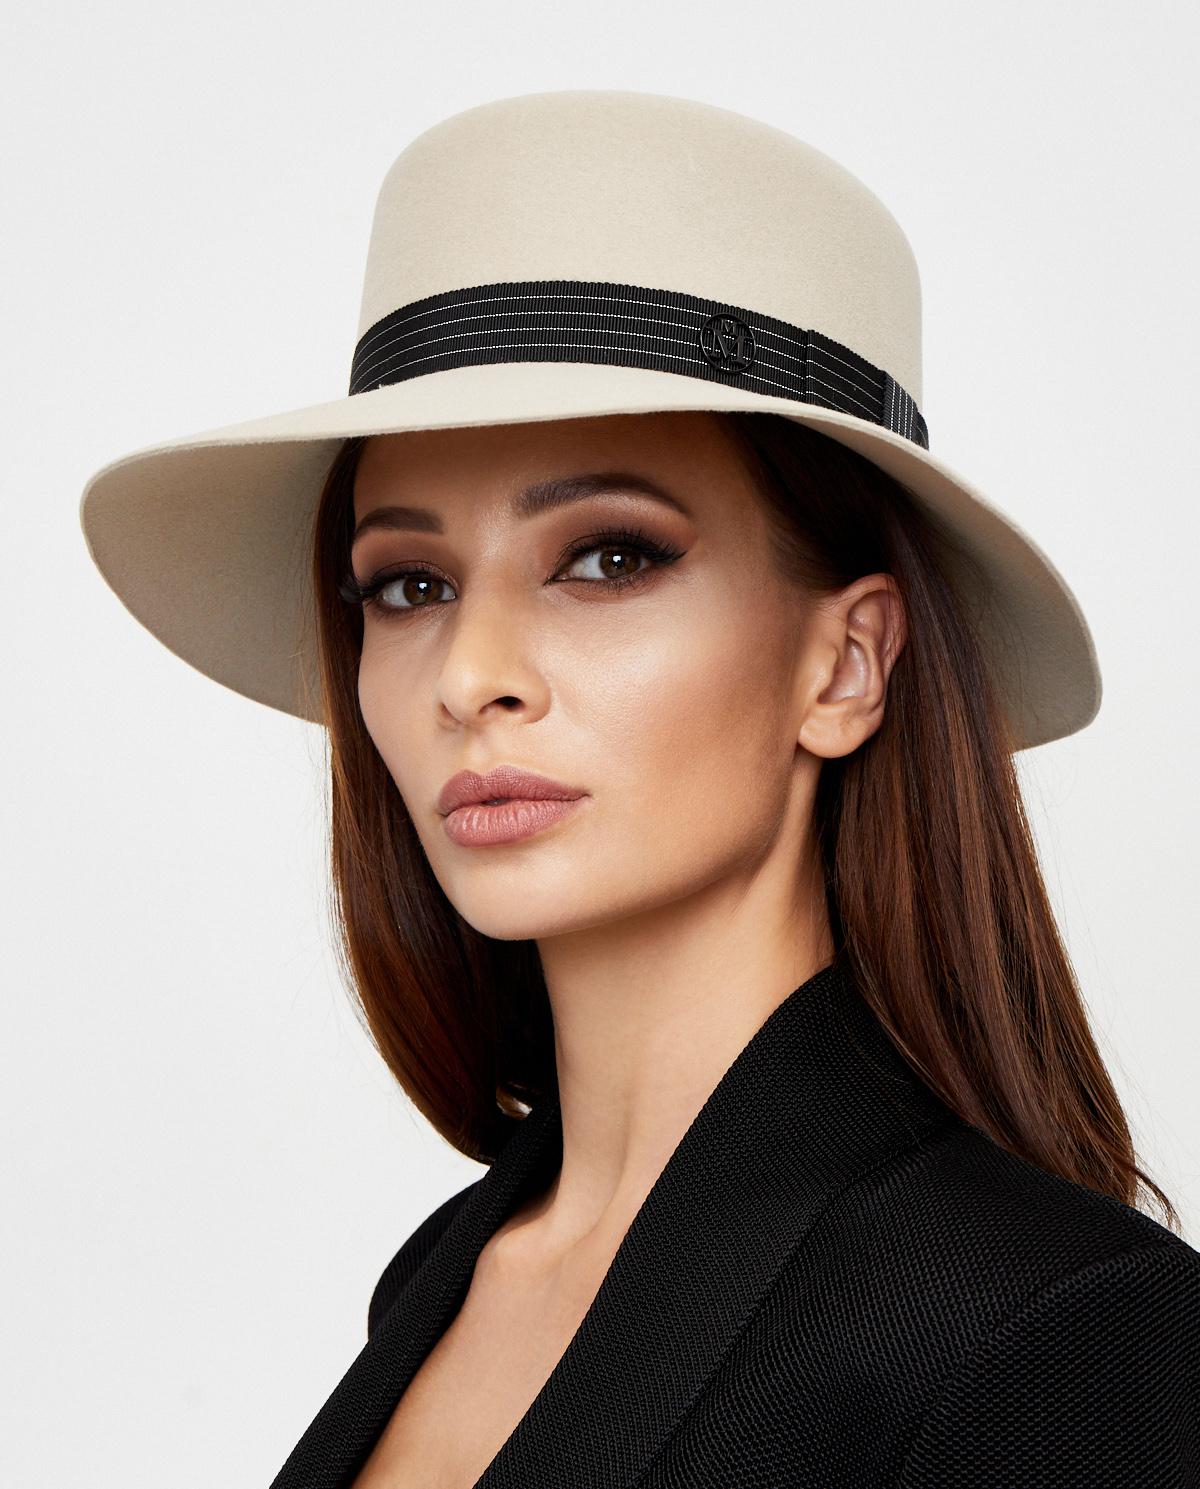 beżowy kapelusz damski Maison Michel Paris 1064034001 BEIGE